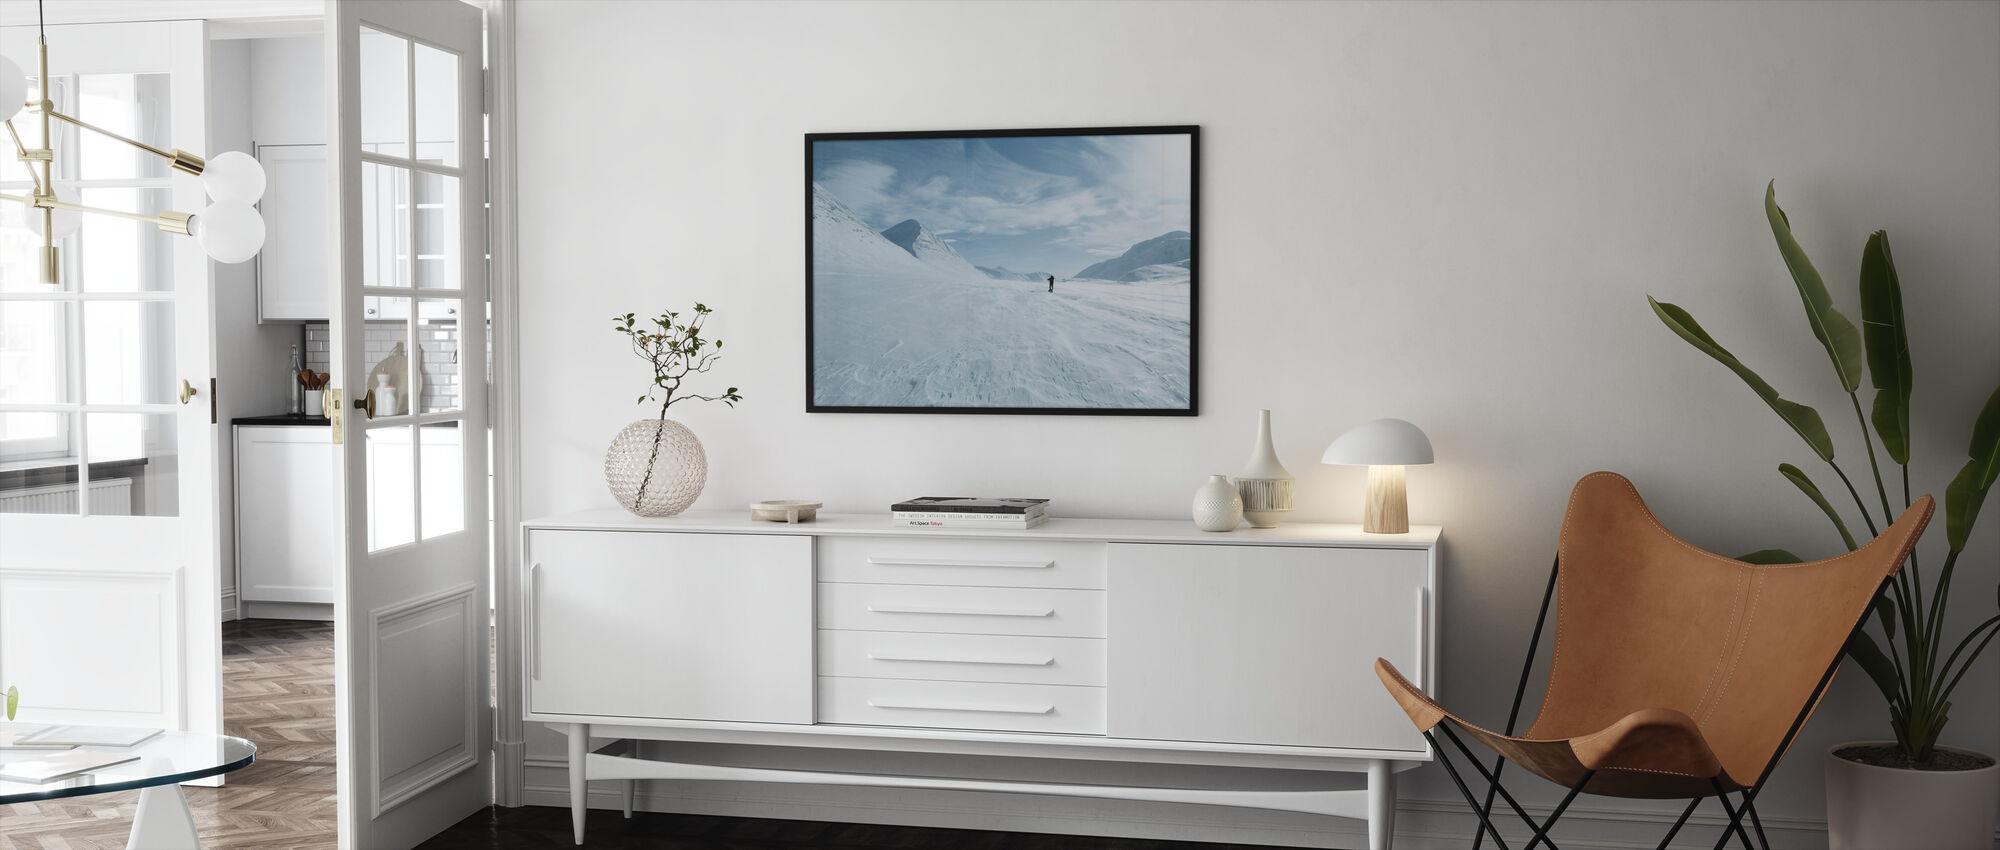 One Man Only - Framed print - Living Room